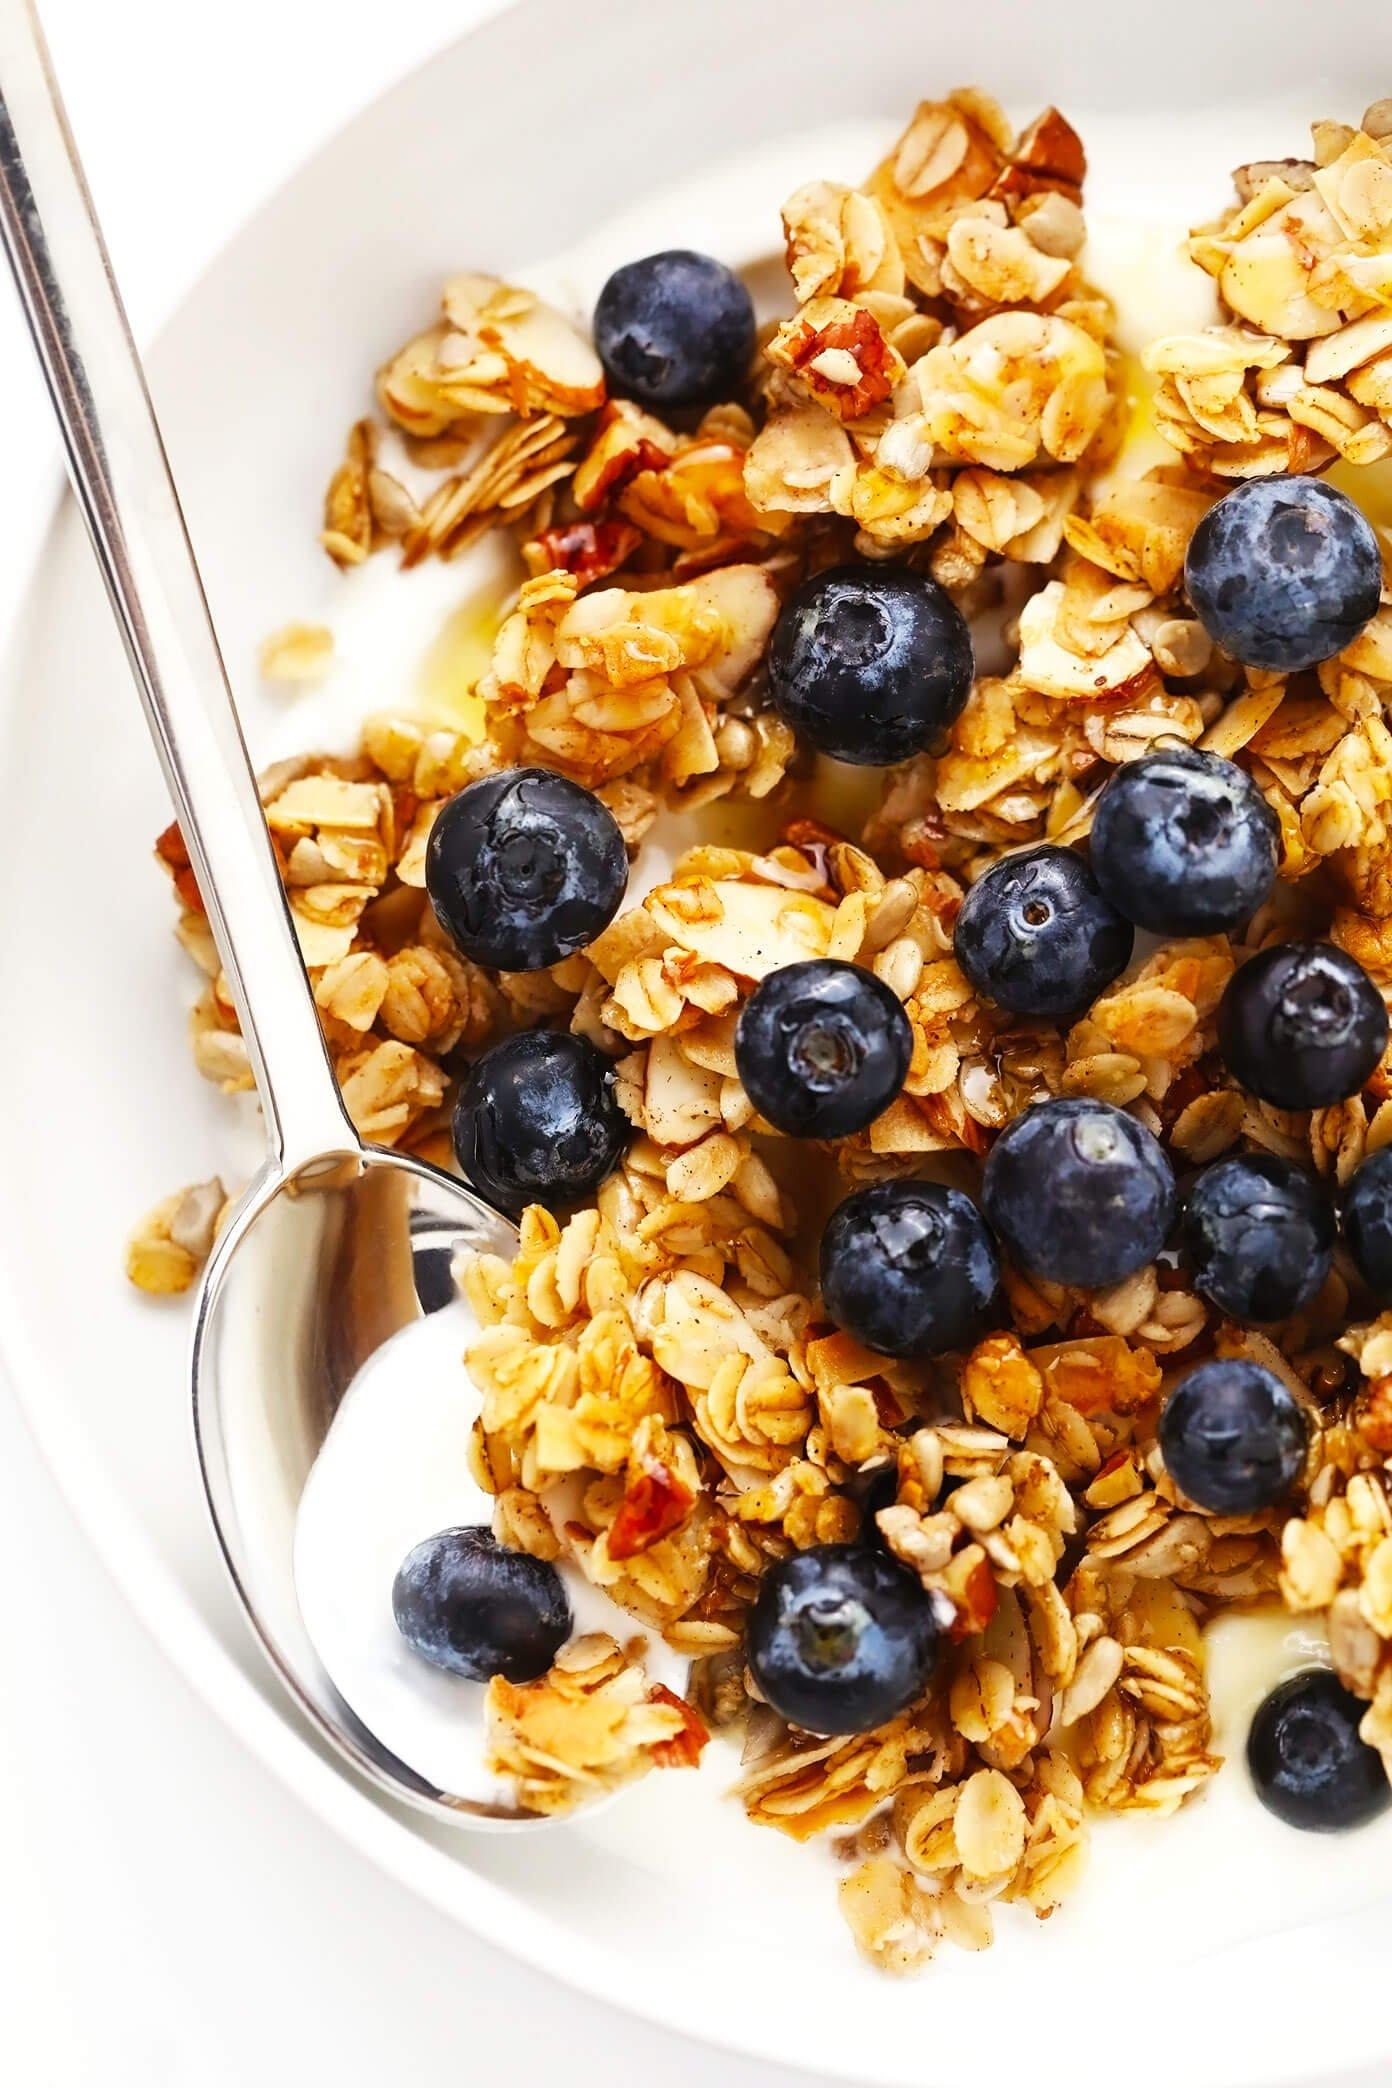 Homemade Granola with Blueberries and Greek Yogurt